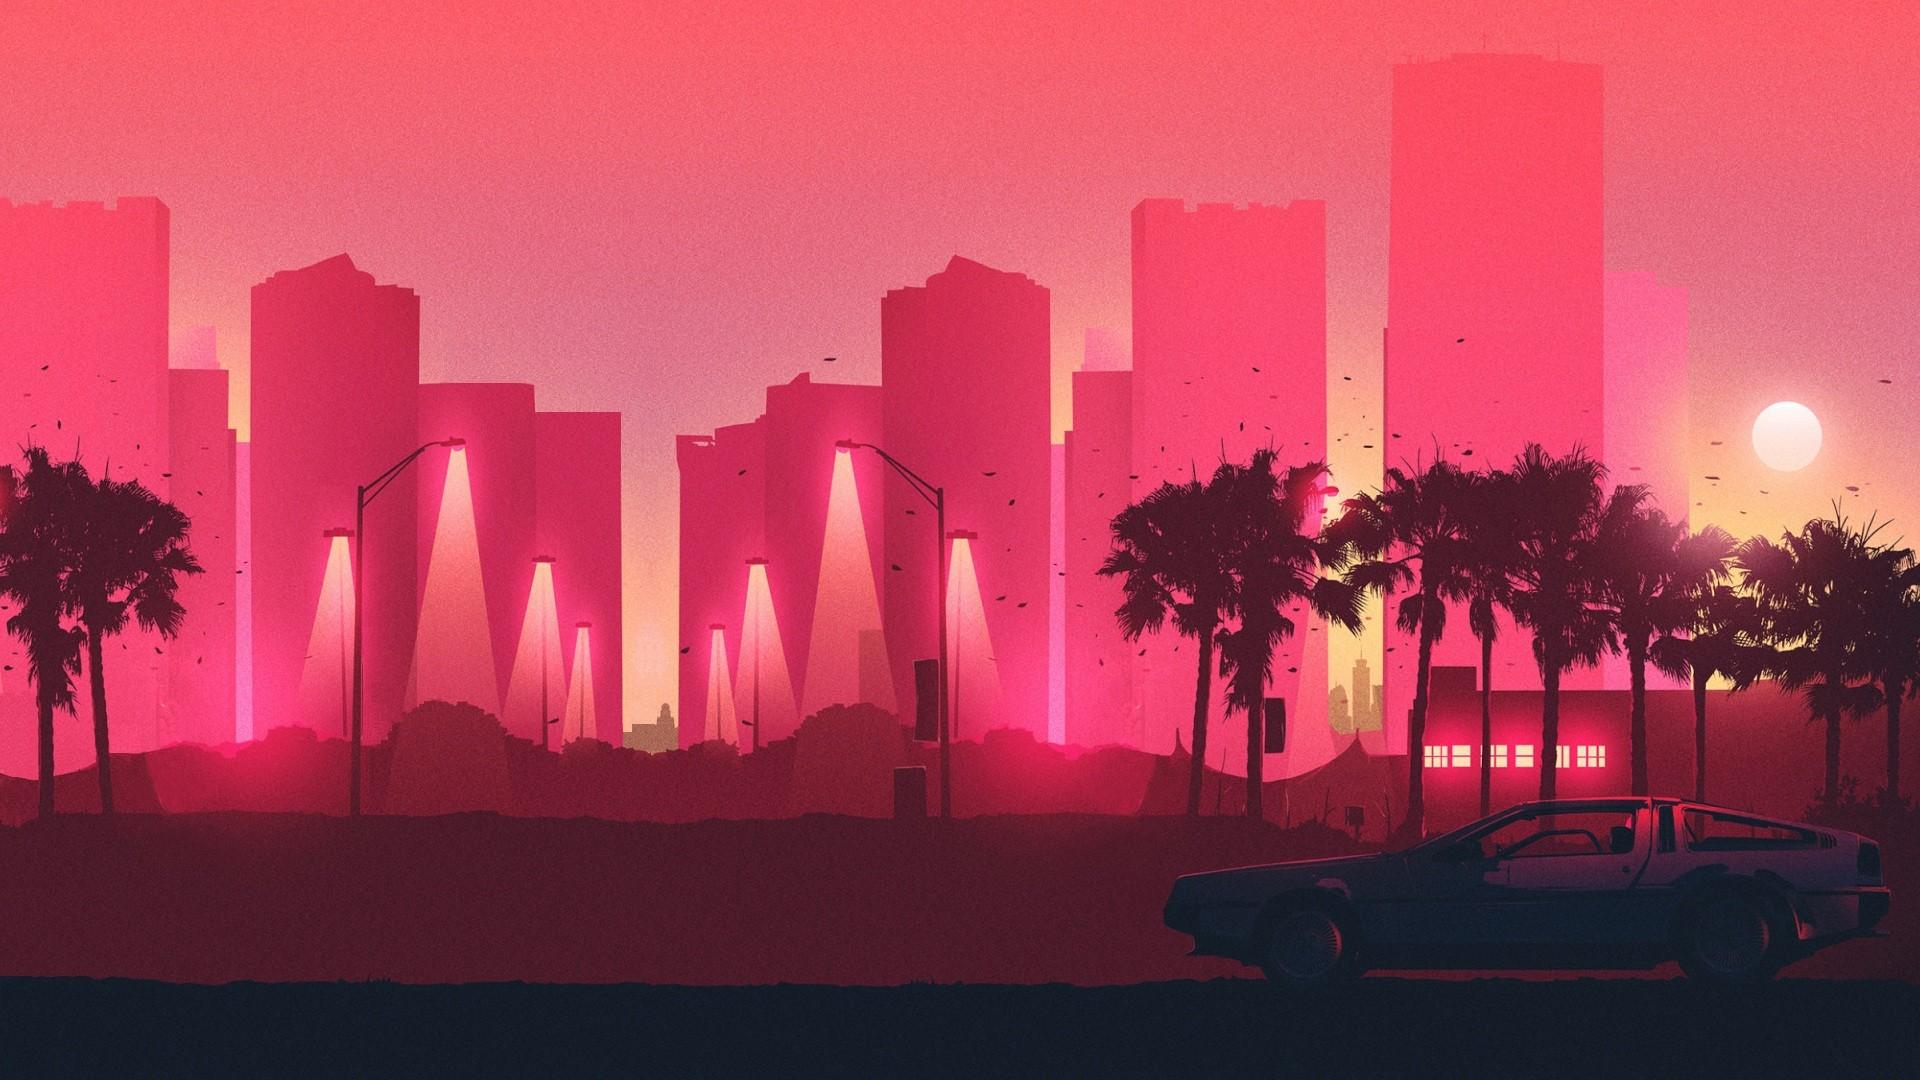 General 1920x1080 synthwave DMC DeLorean DeLorean palm trees Back to the Future artwork 80sCity pink cityscape car